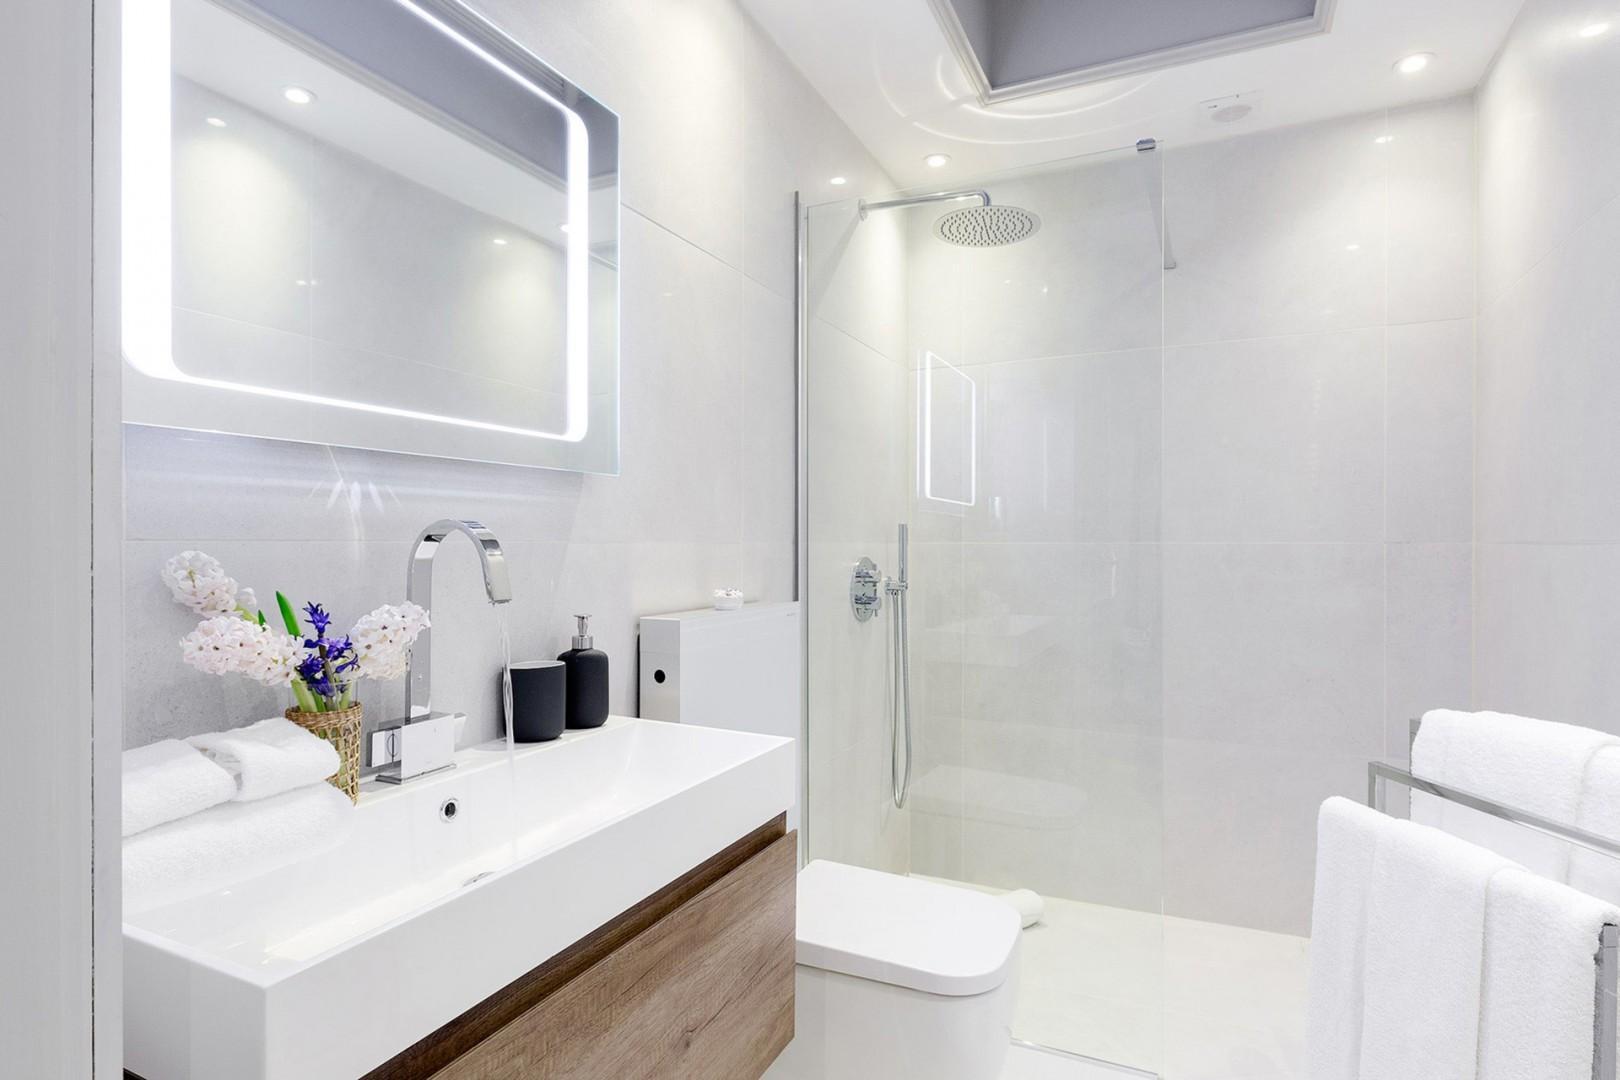 Rainfall showerhead in bathroom 2